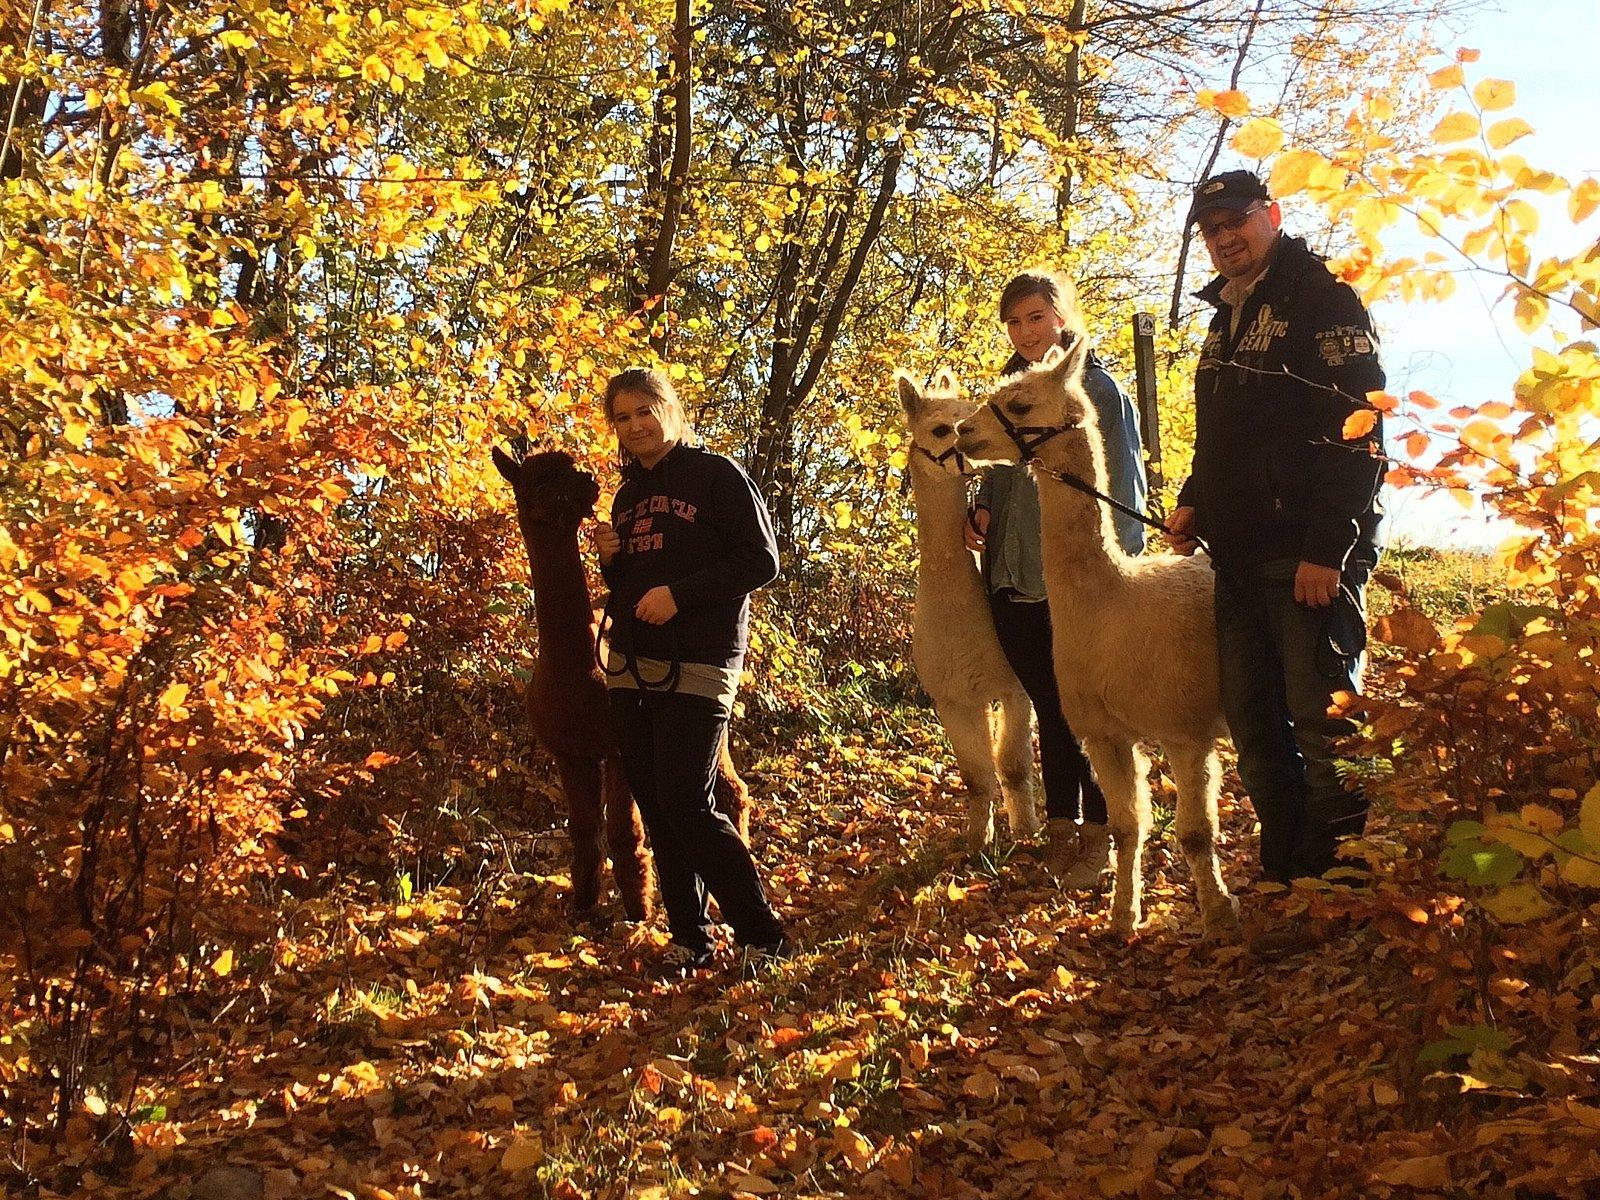 Familienwanderung Foto:Graceland Alpacas Wehrsdorf